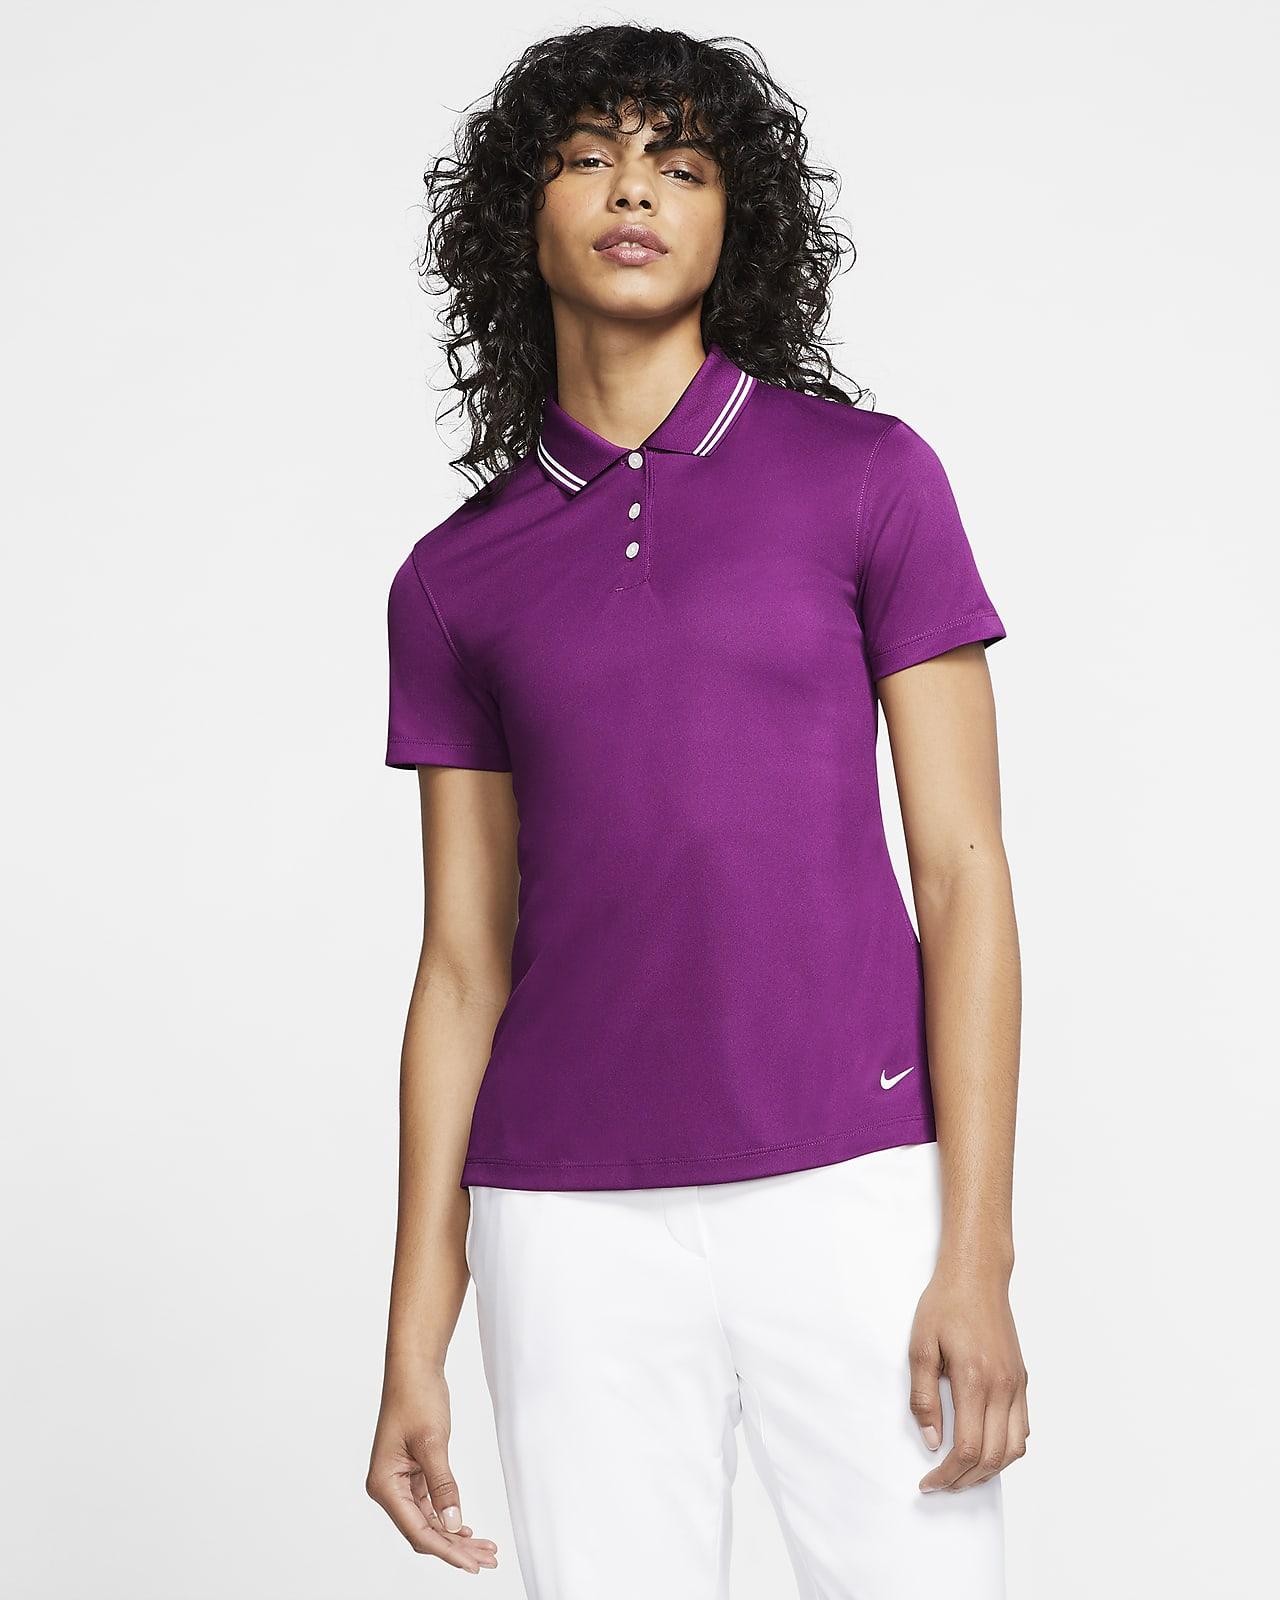 Nike Dri-FIT Victory Women's Golf Polo